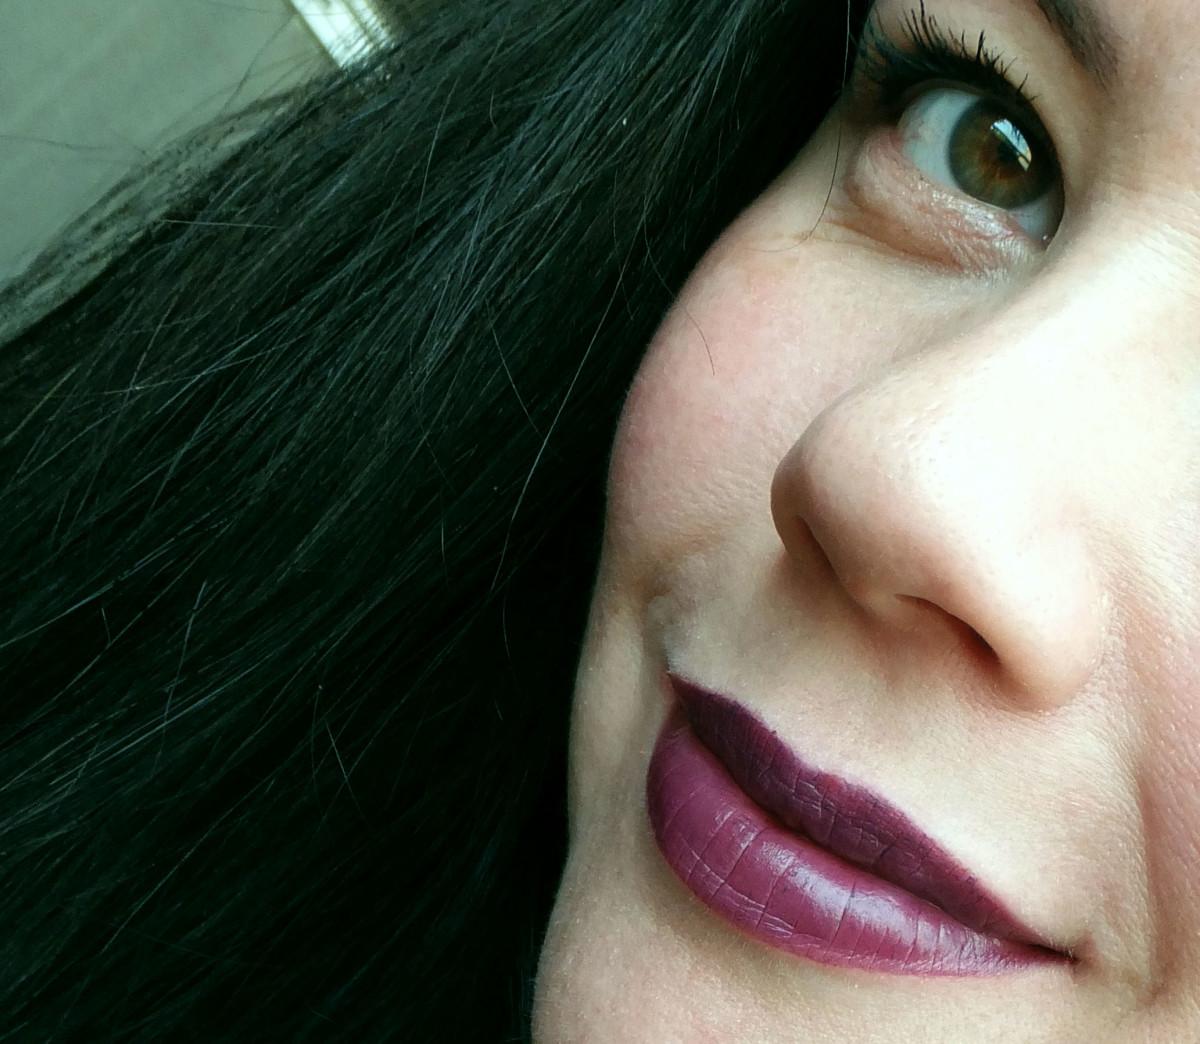 Rimmel London Lasting Finish by Kate lipstick_04